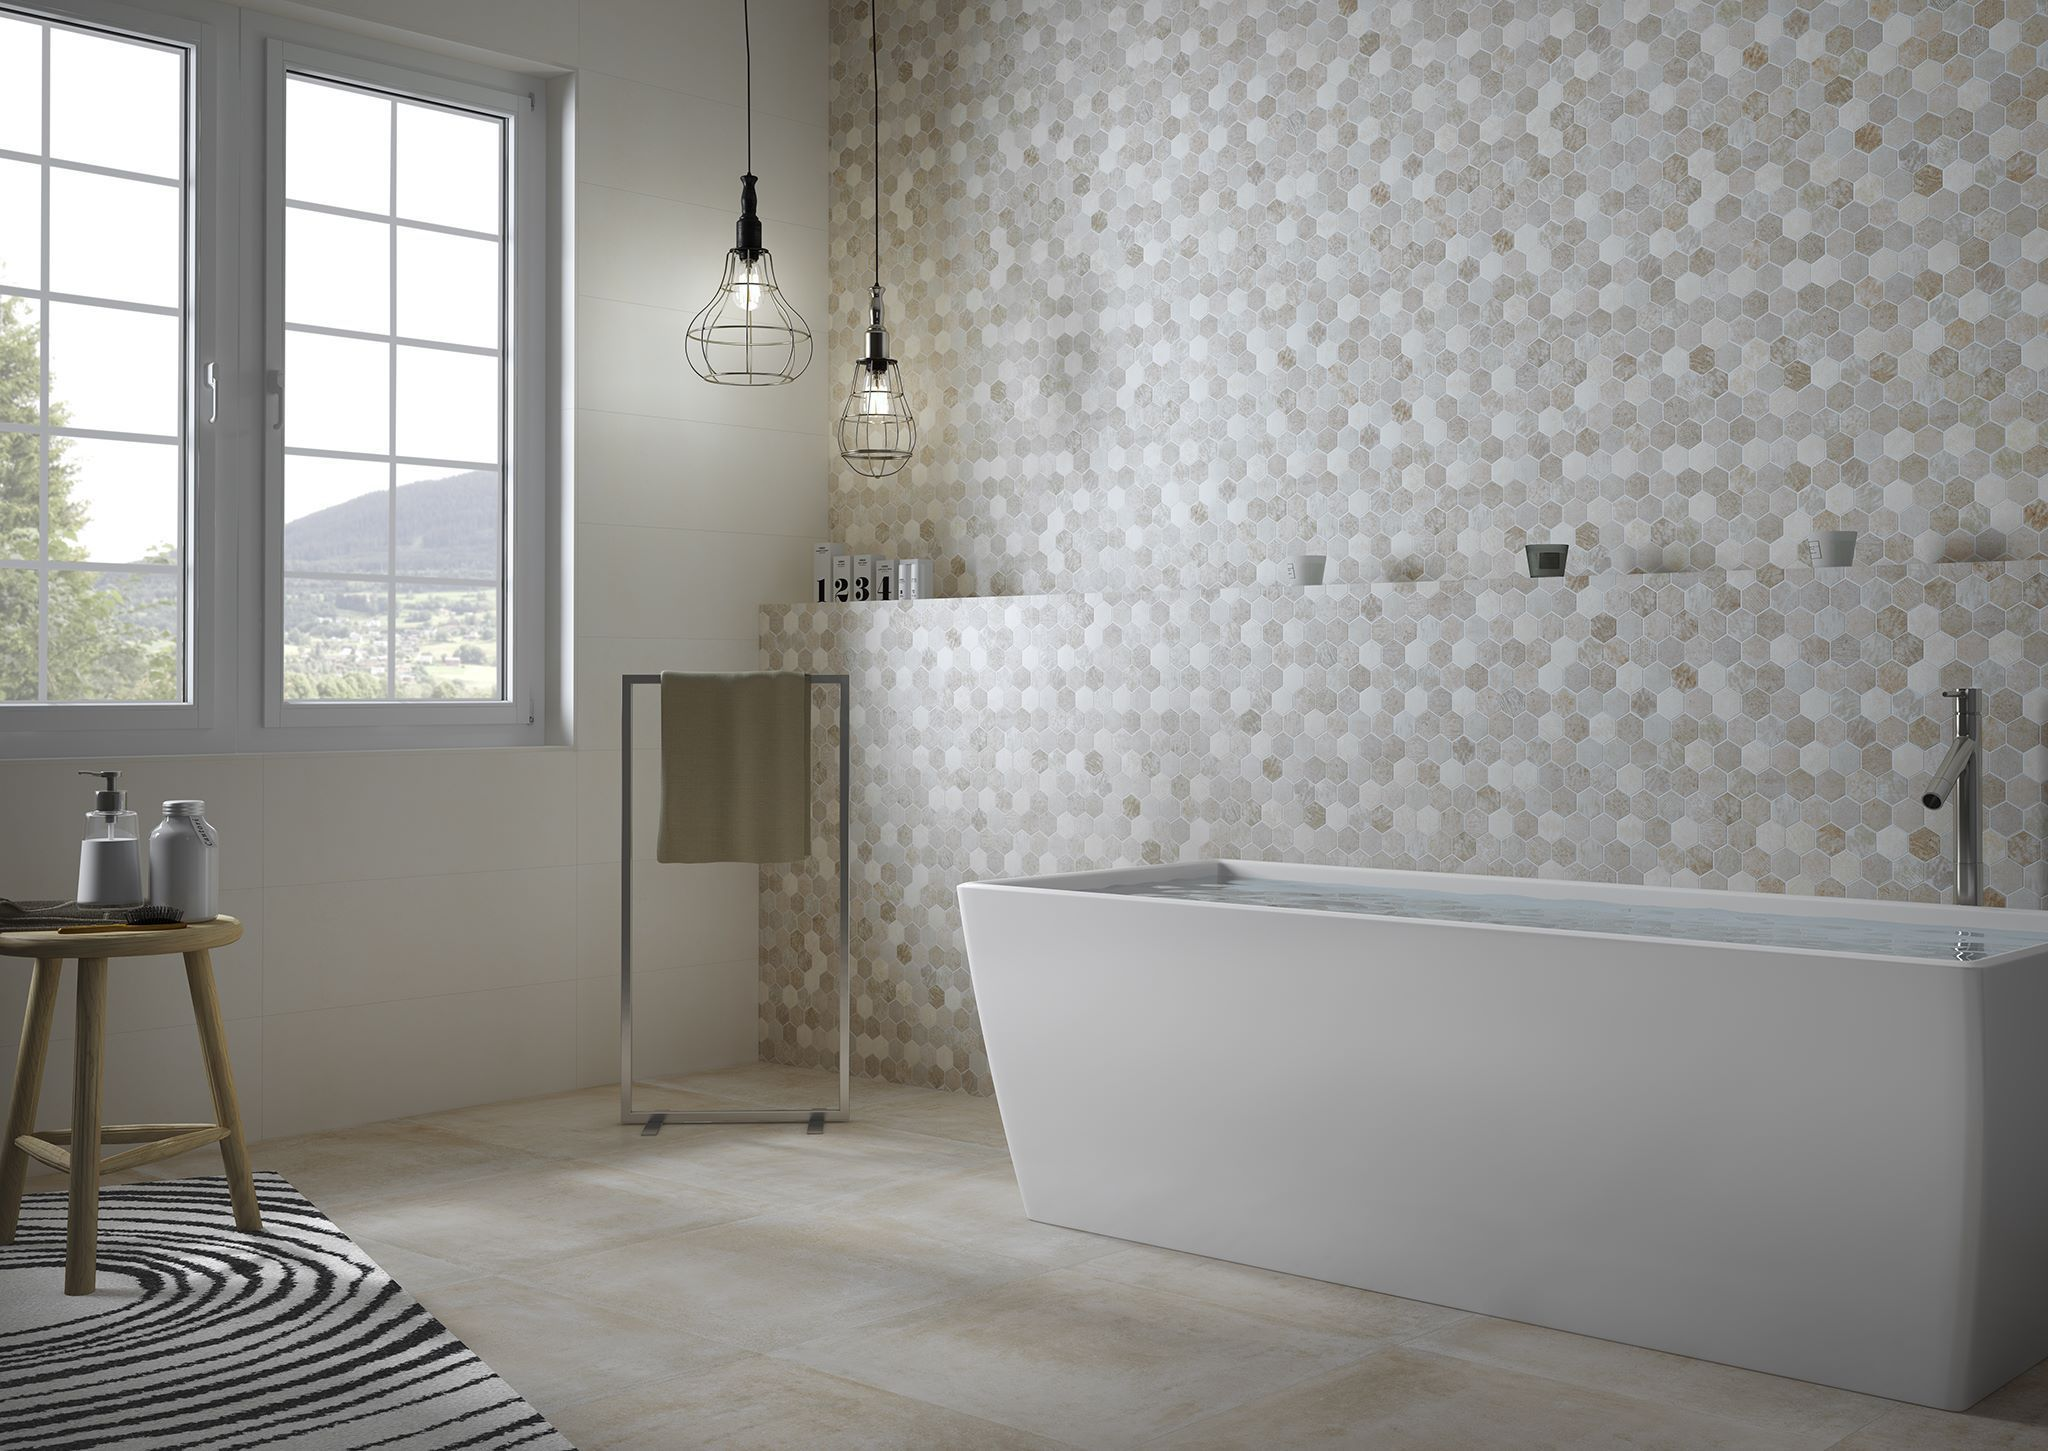 Piastrelle Esagonali Per Bagno : Piastrella da bagno da parete in ceramica esagonale